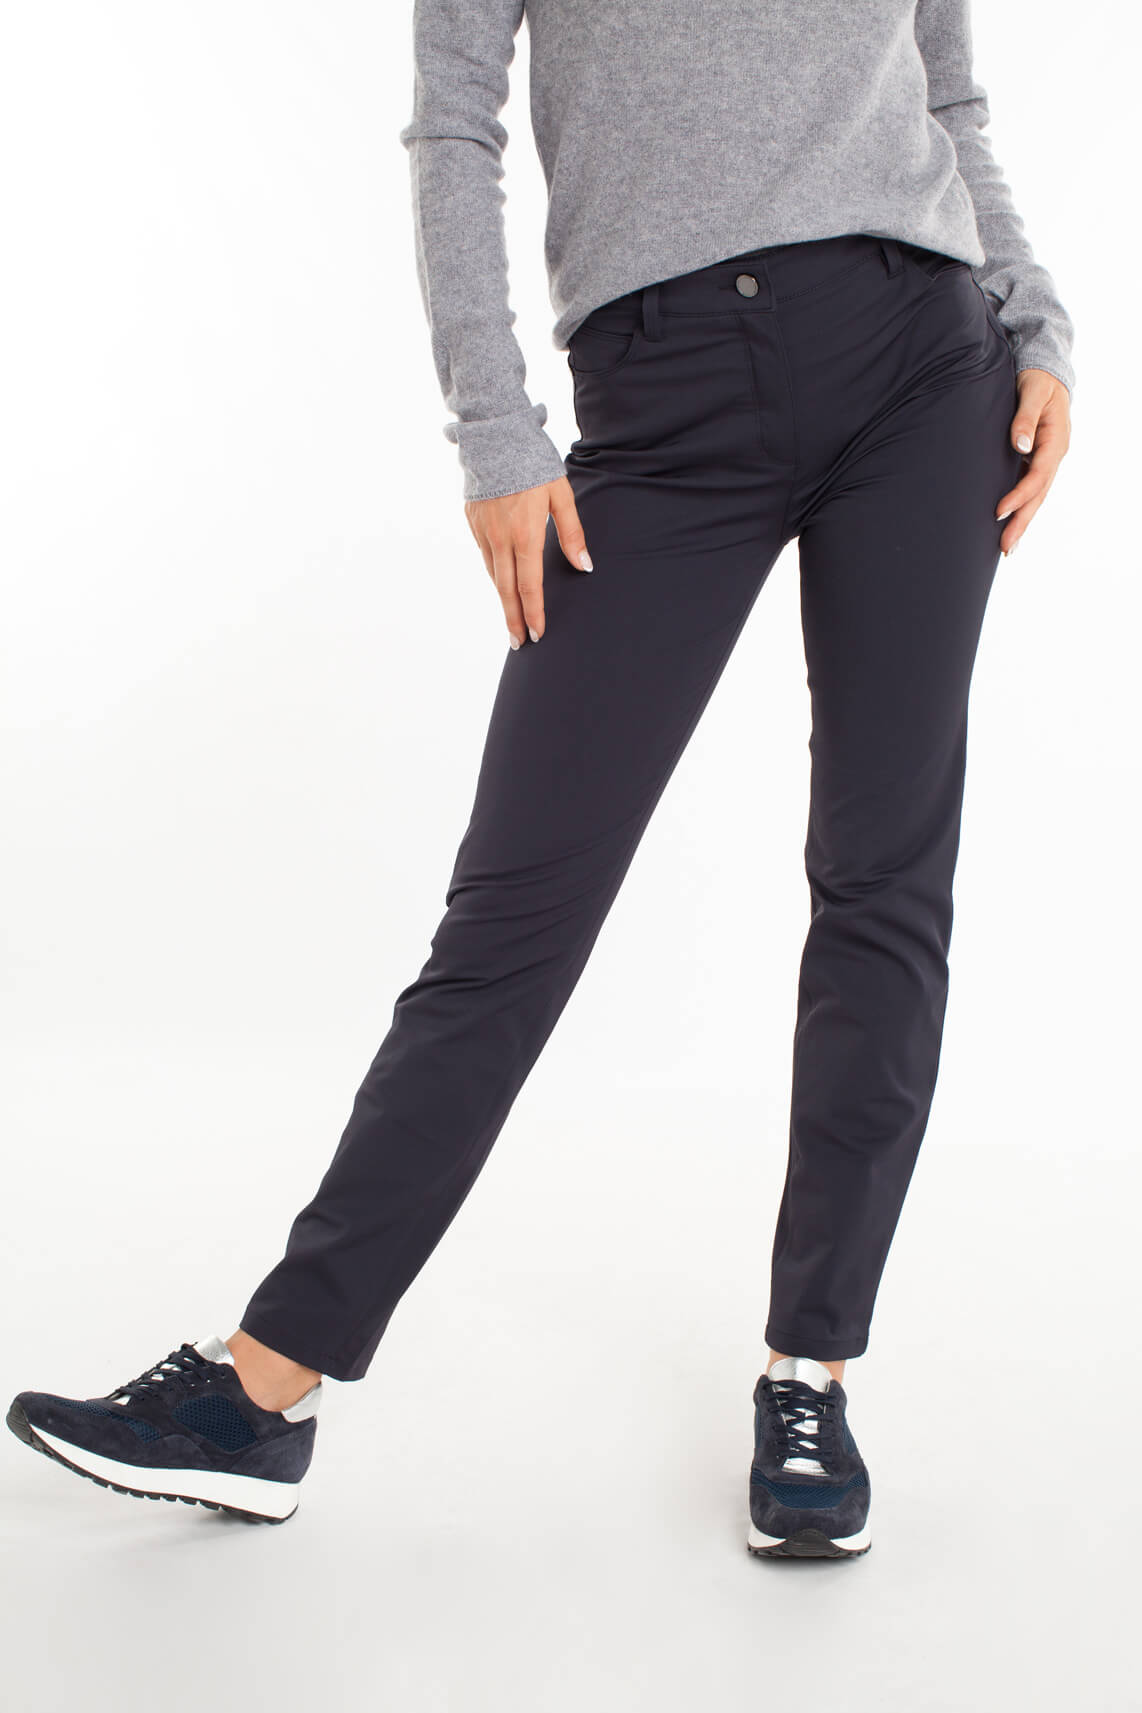 Rosner Dames Audrey pantalon Blauw